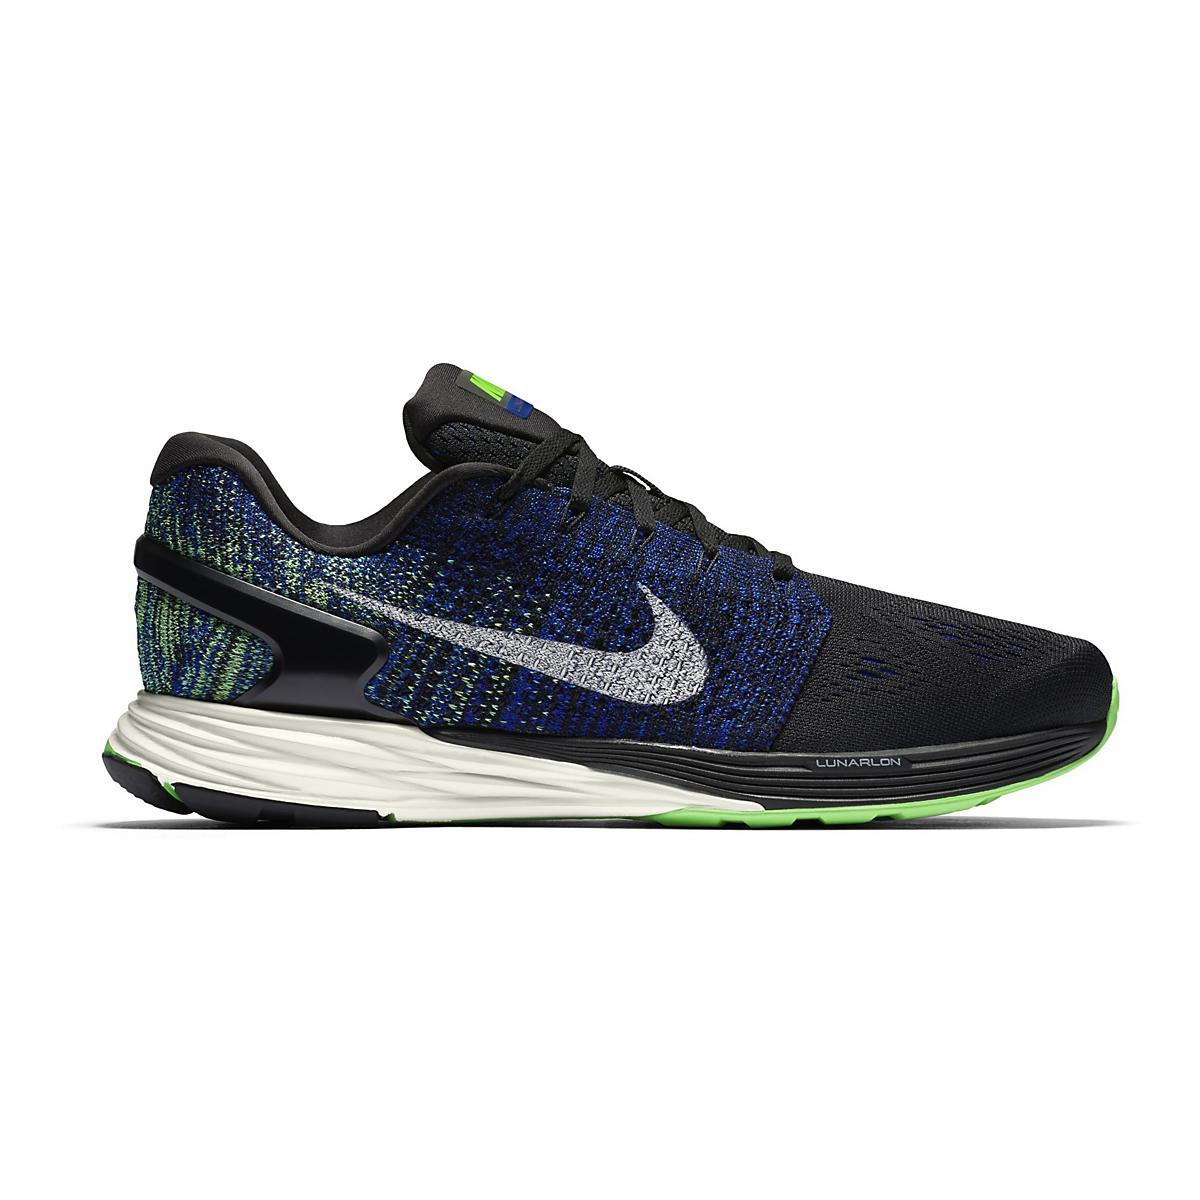 Men's Nike�LunarGlide 7